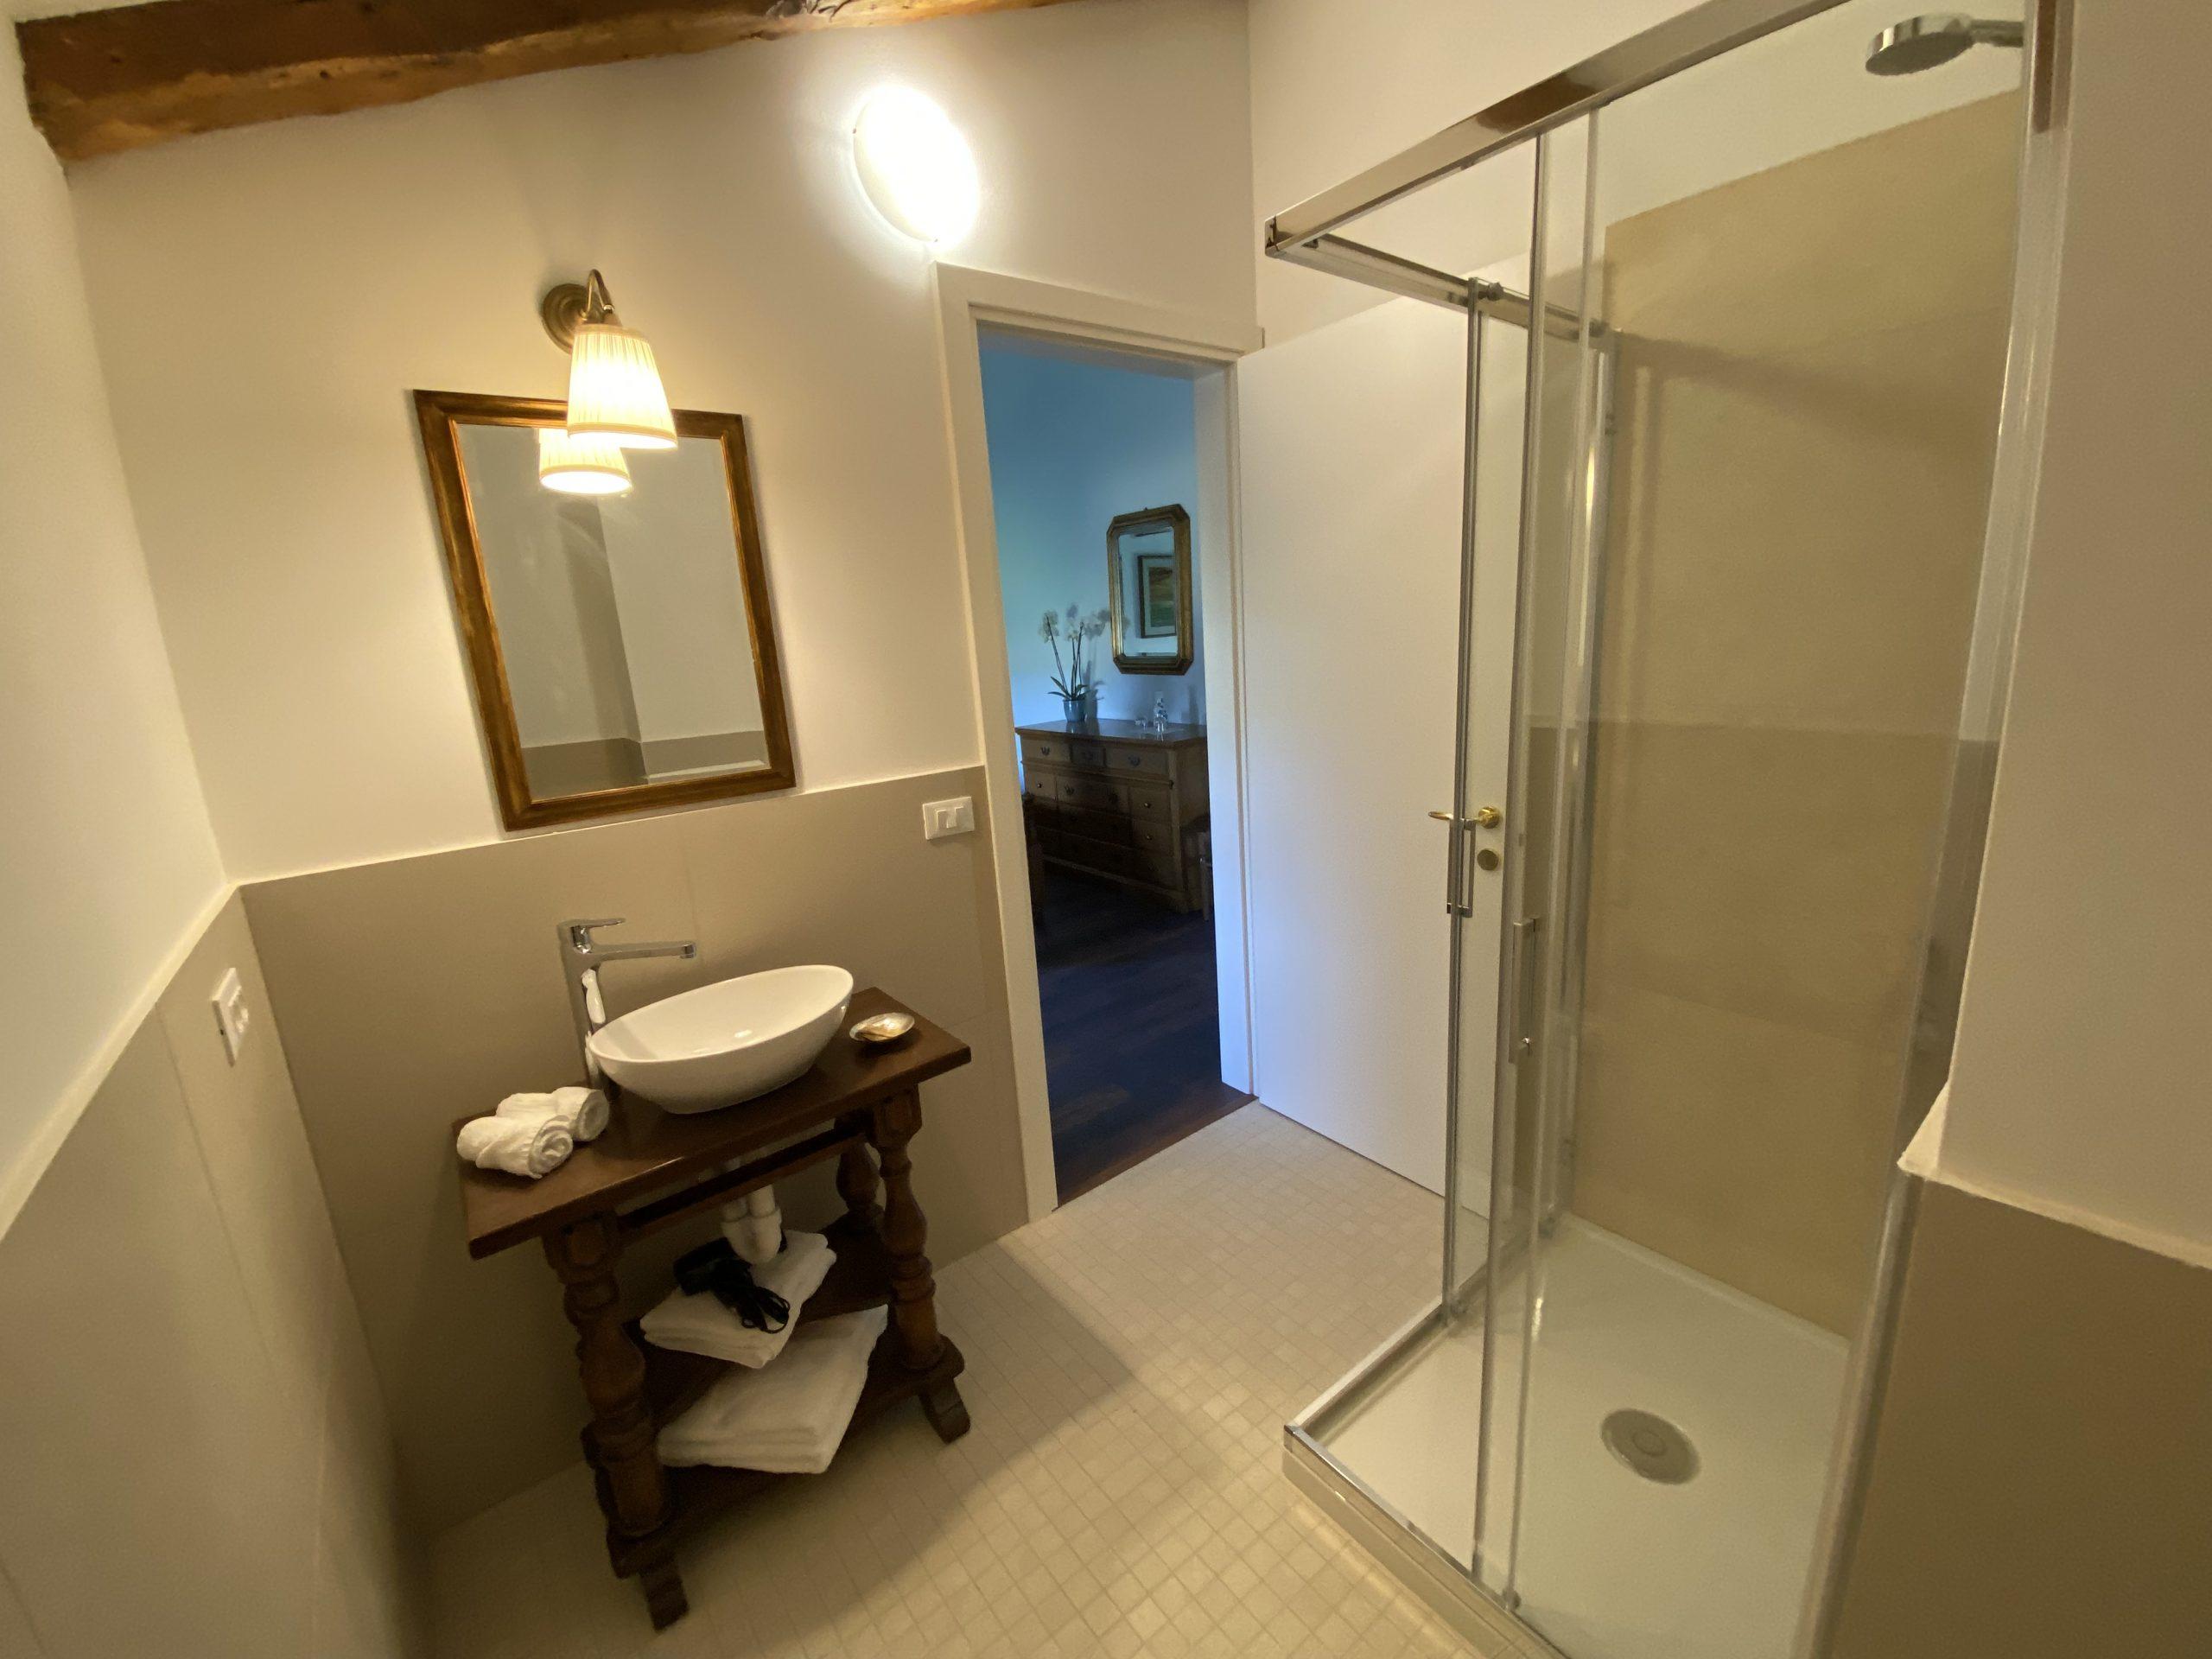 Badezimmer Aufnahme